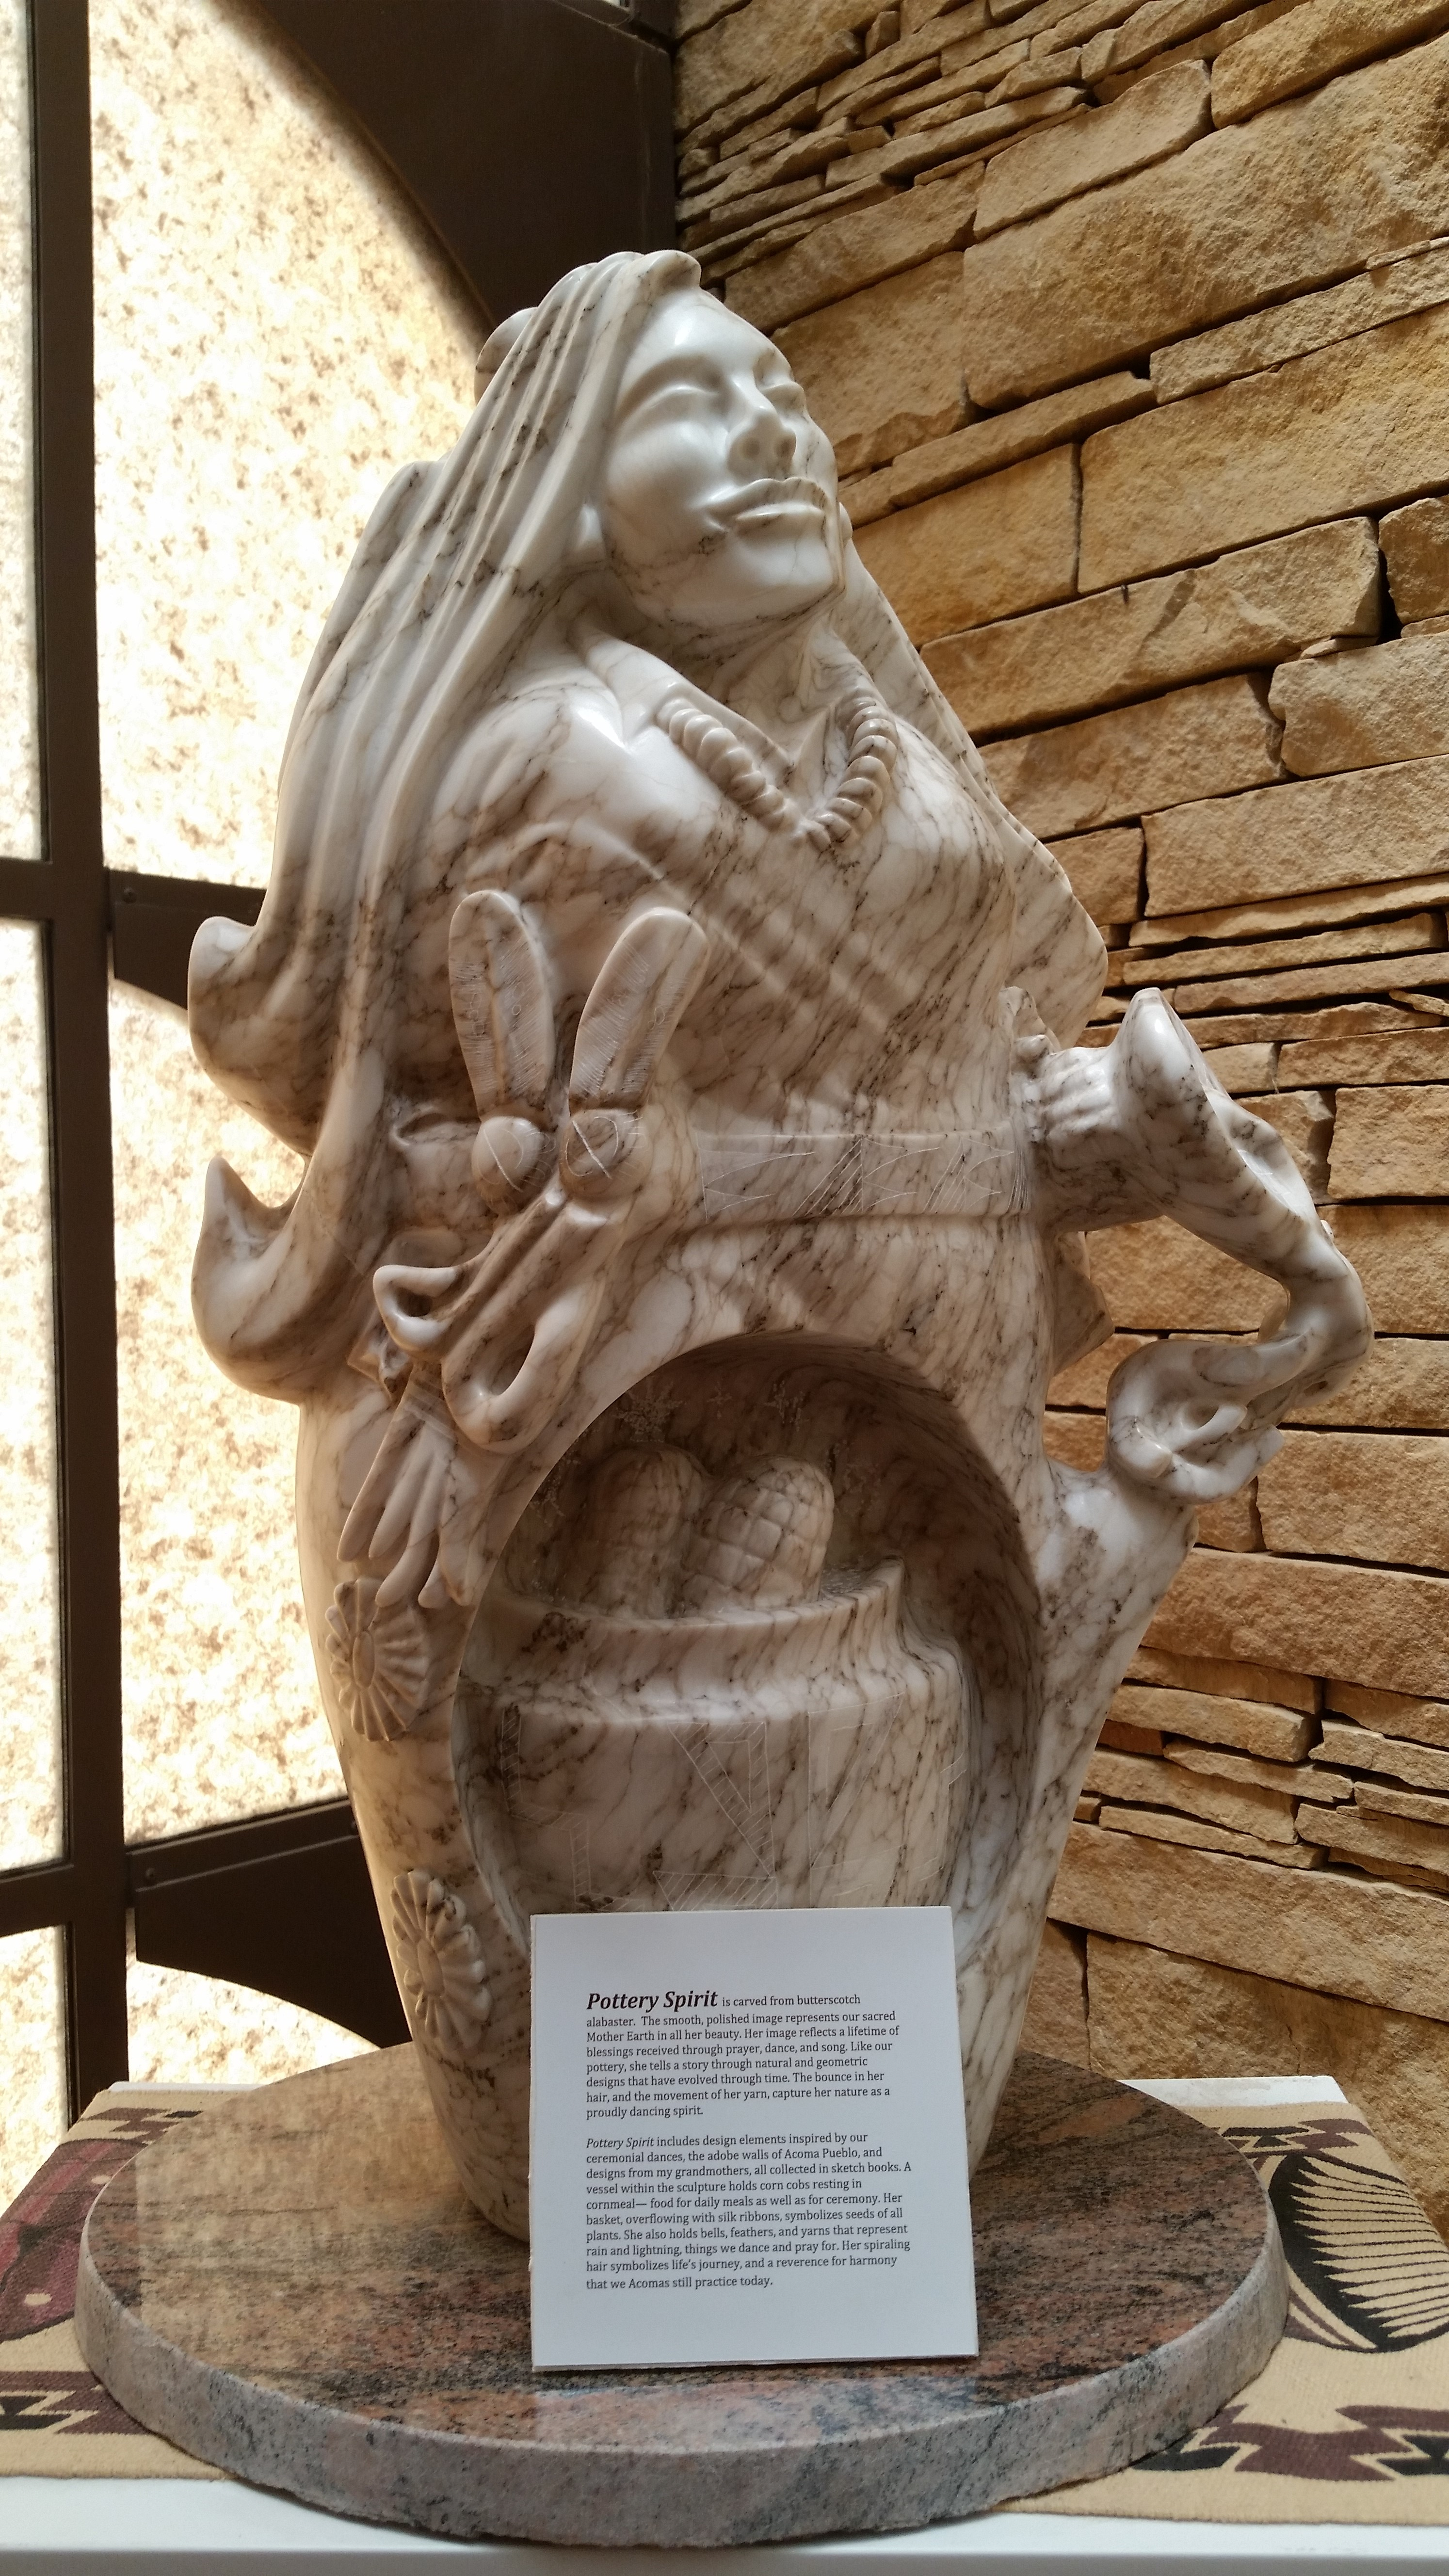 """Pottery Spirit"""